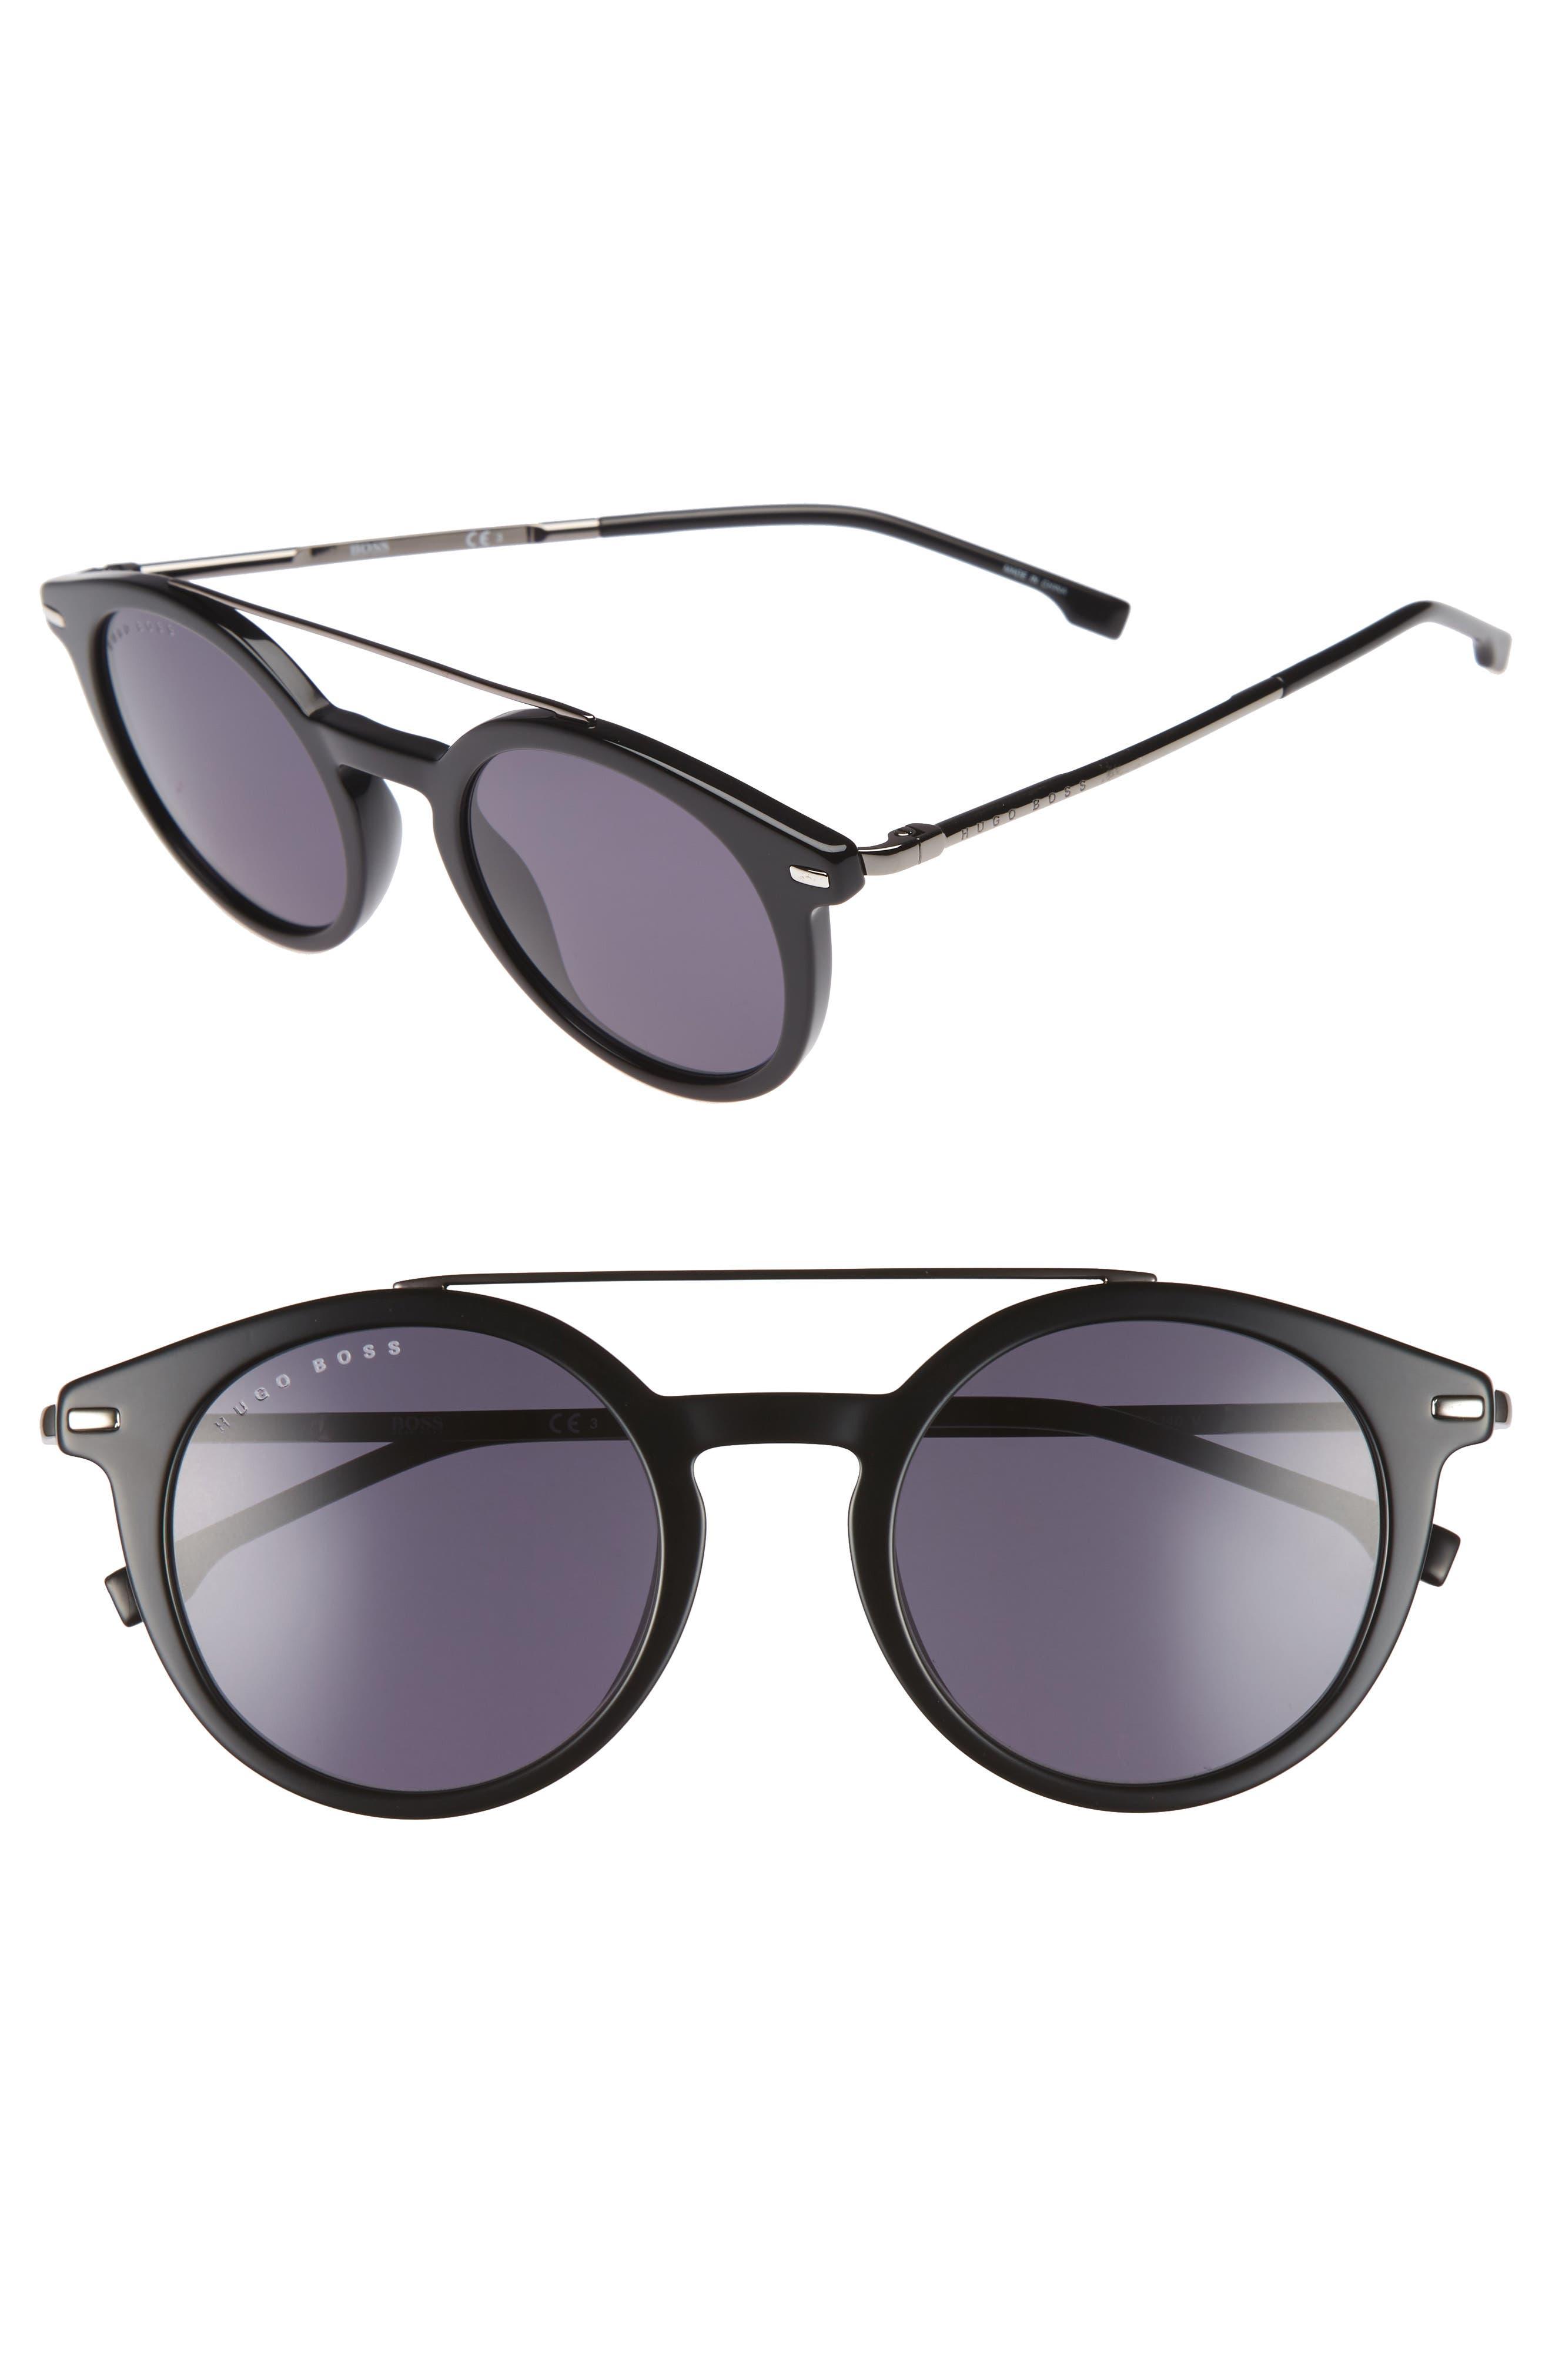 Alternate Image 1 Selected - BOSS B0926S 49mm Polarized Sunglasses